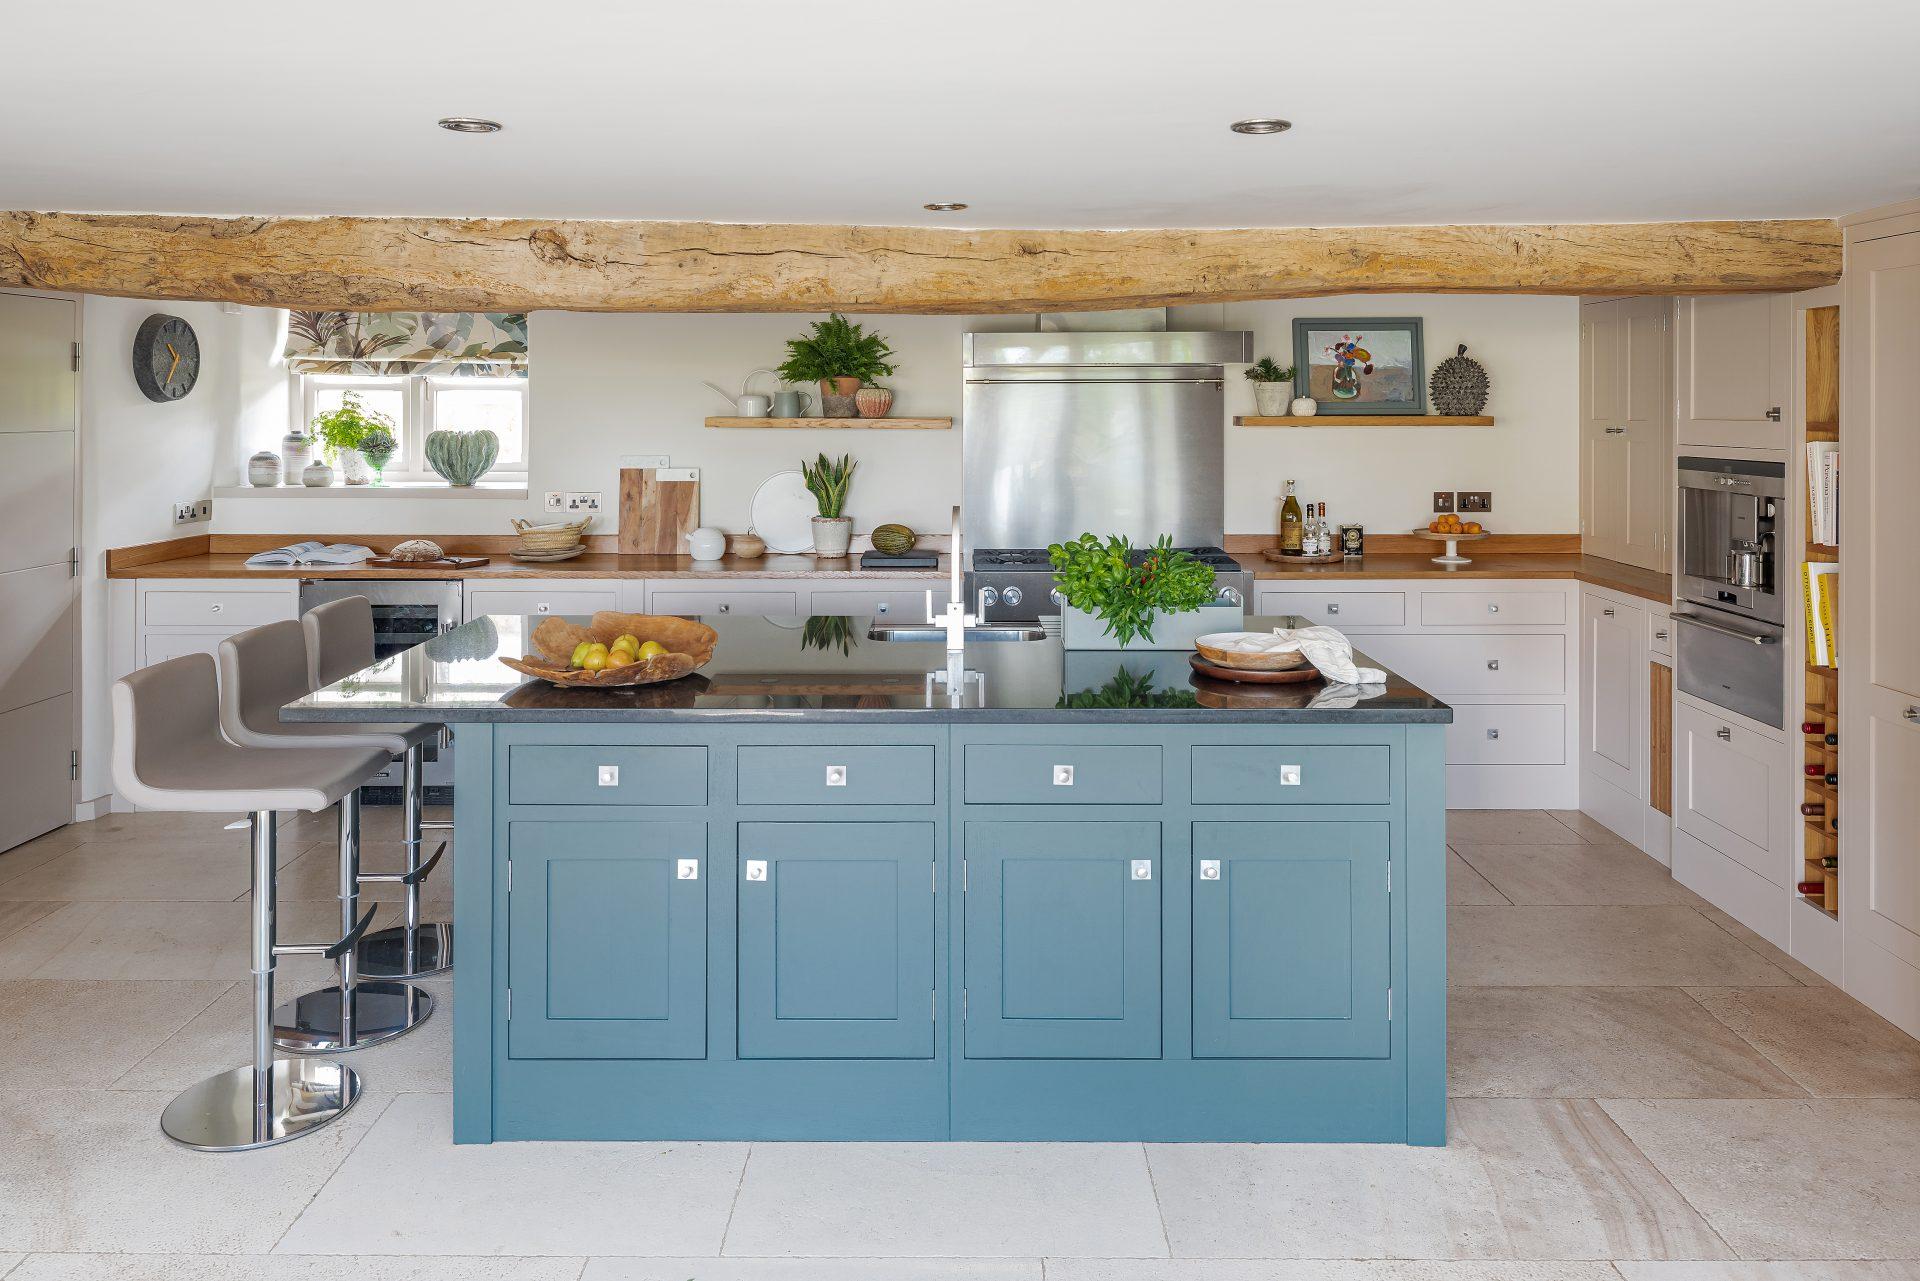 4.-WL-Dovecote-Kitchen-ph1-by-Pete-Helme-Photography_1